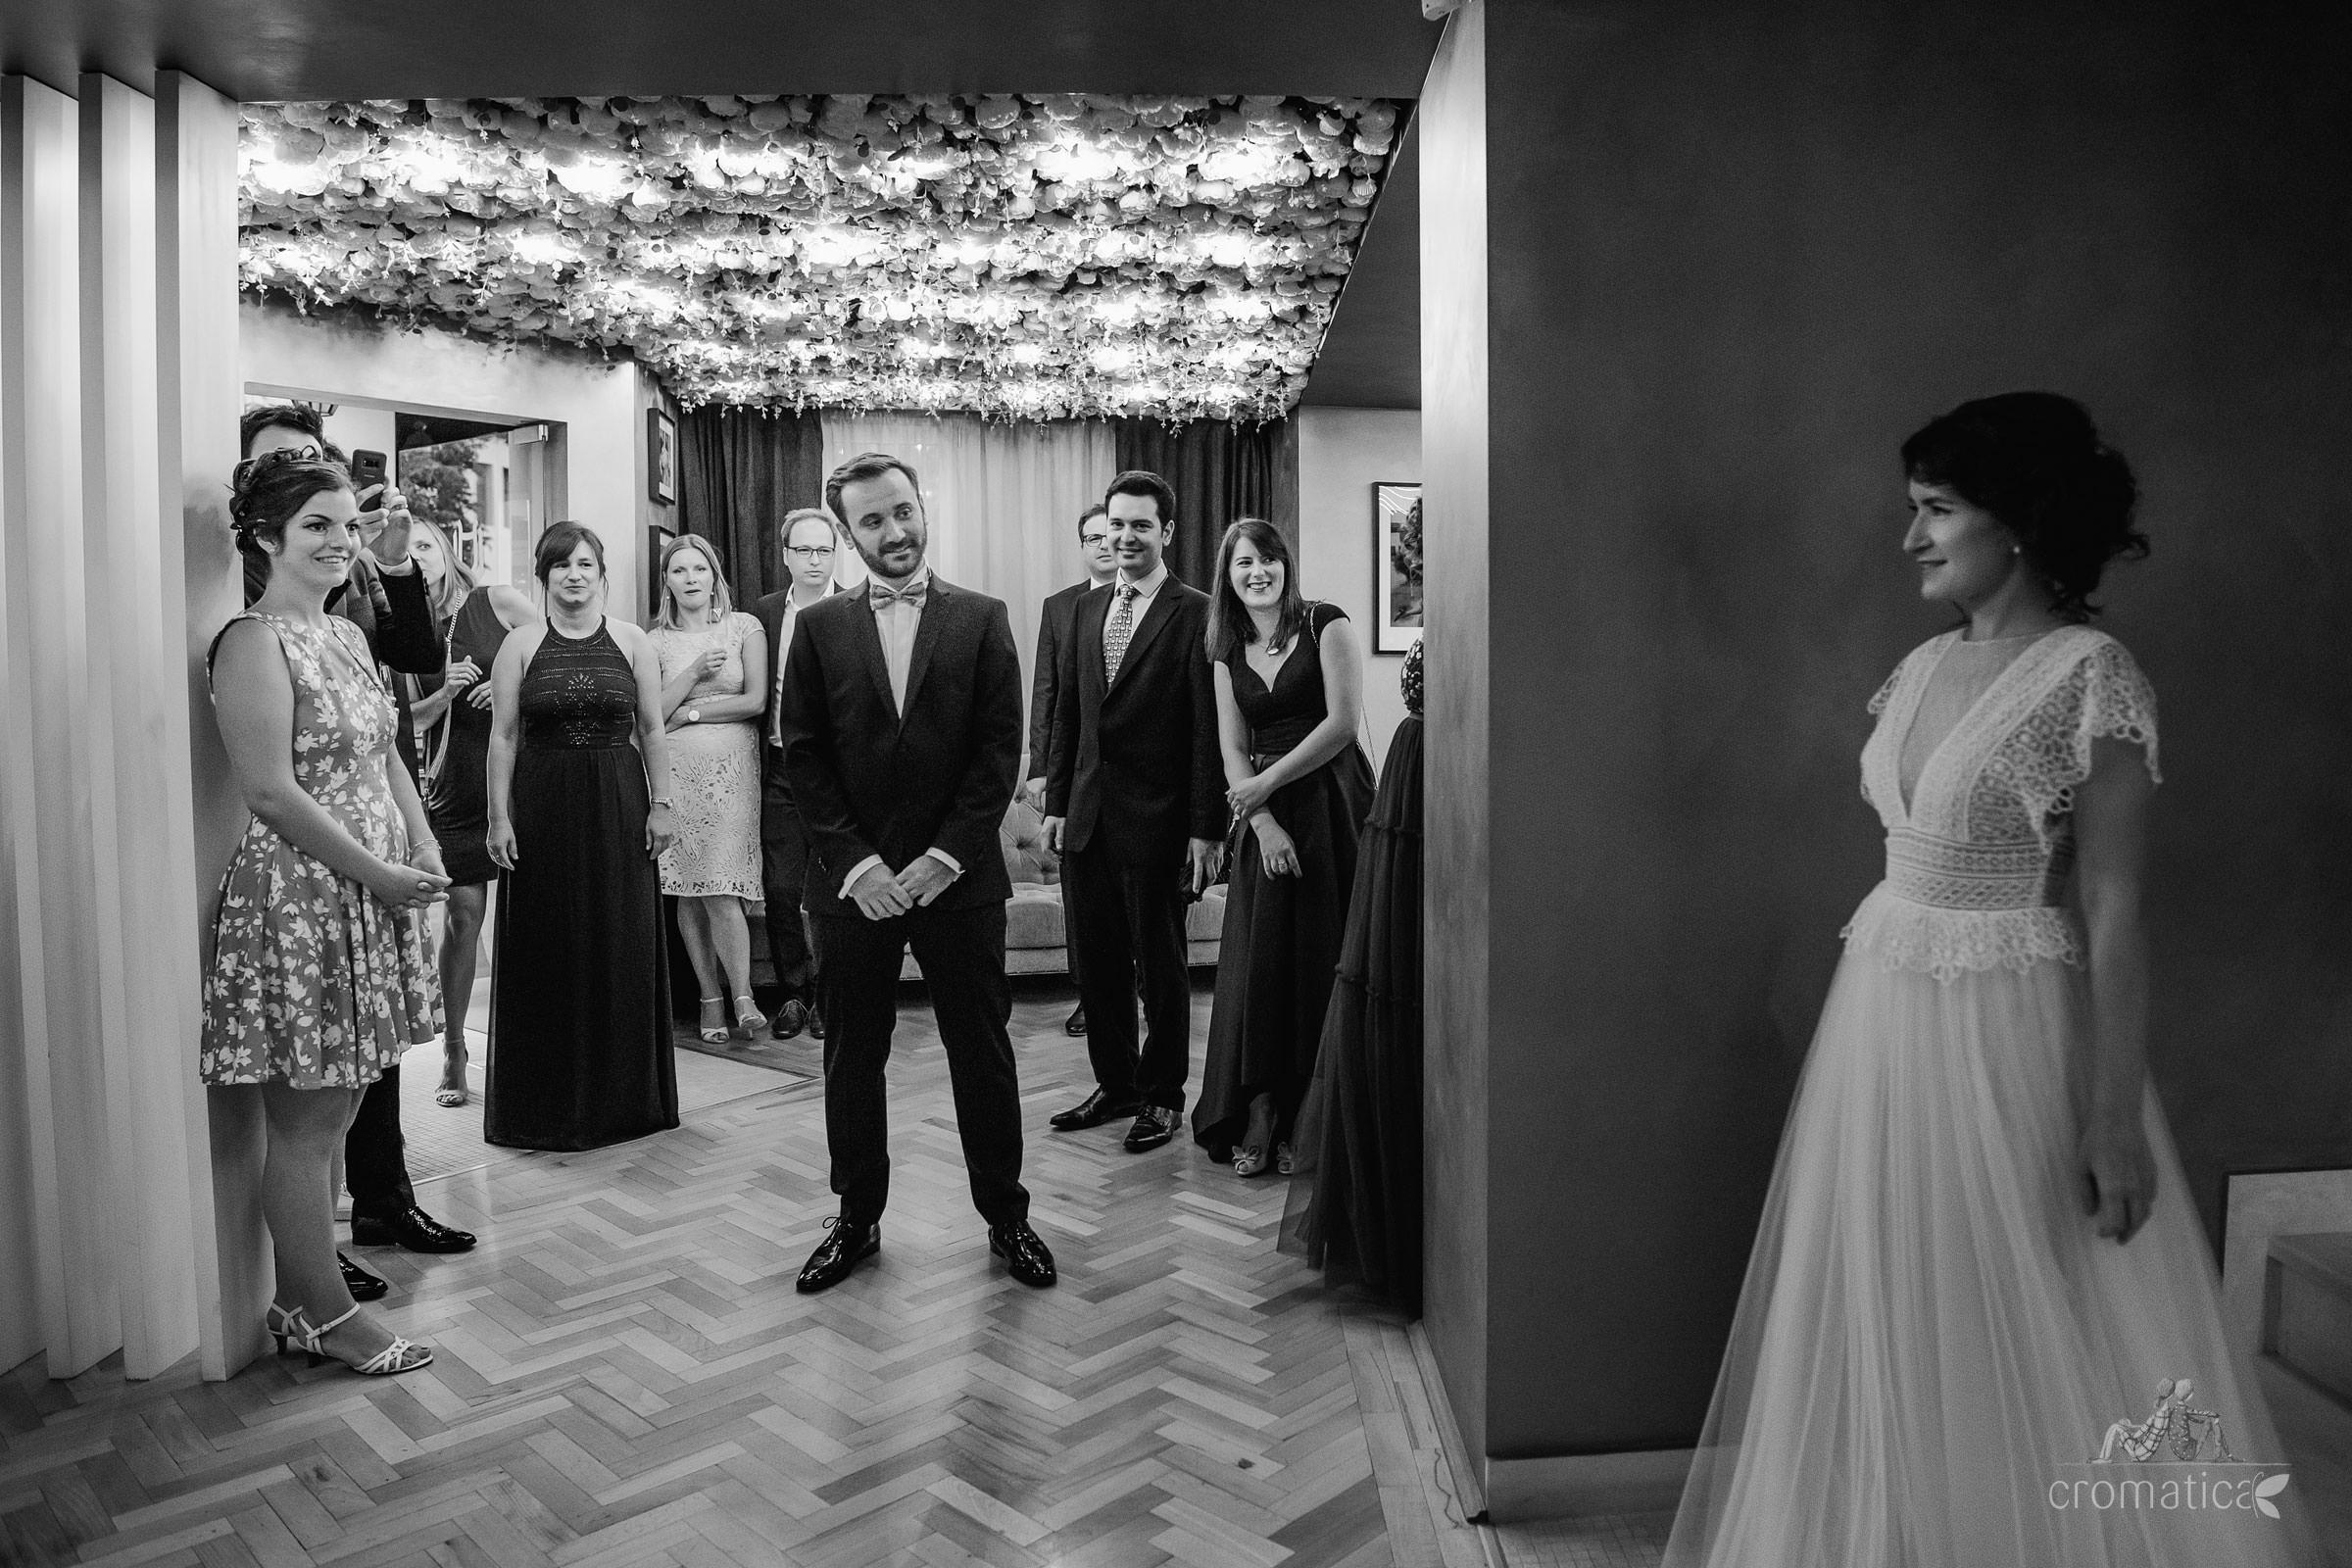 roxana mihai fotografii nunta la seratta 028